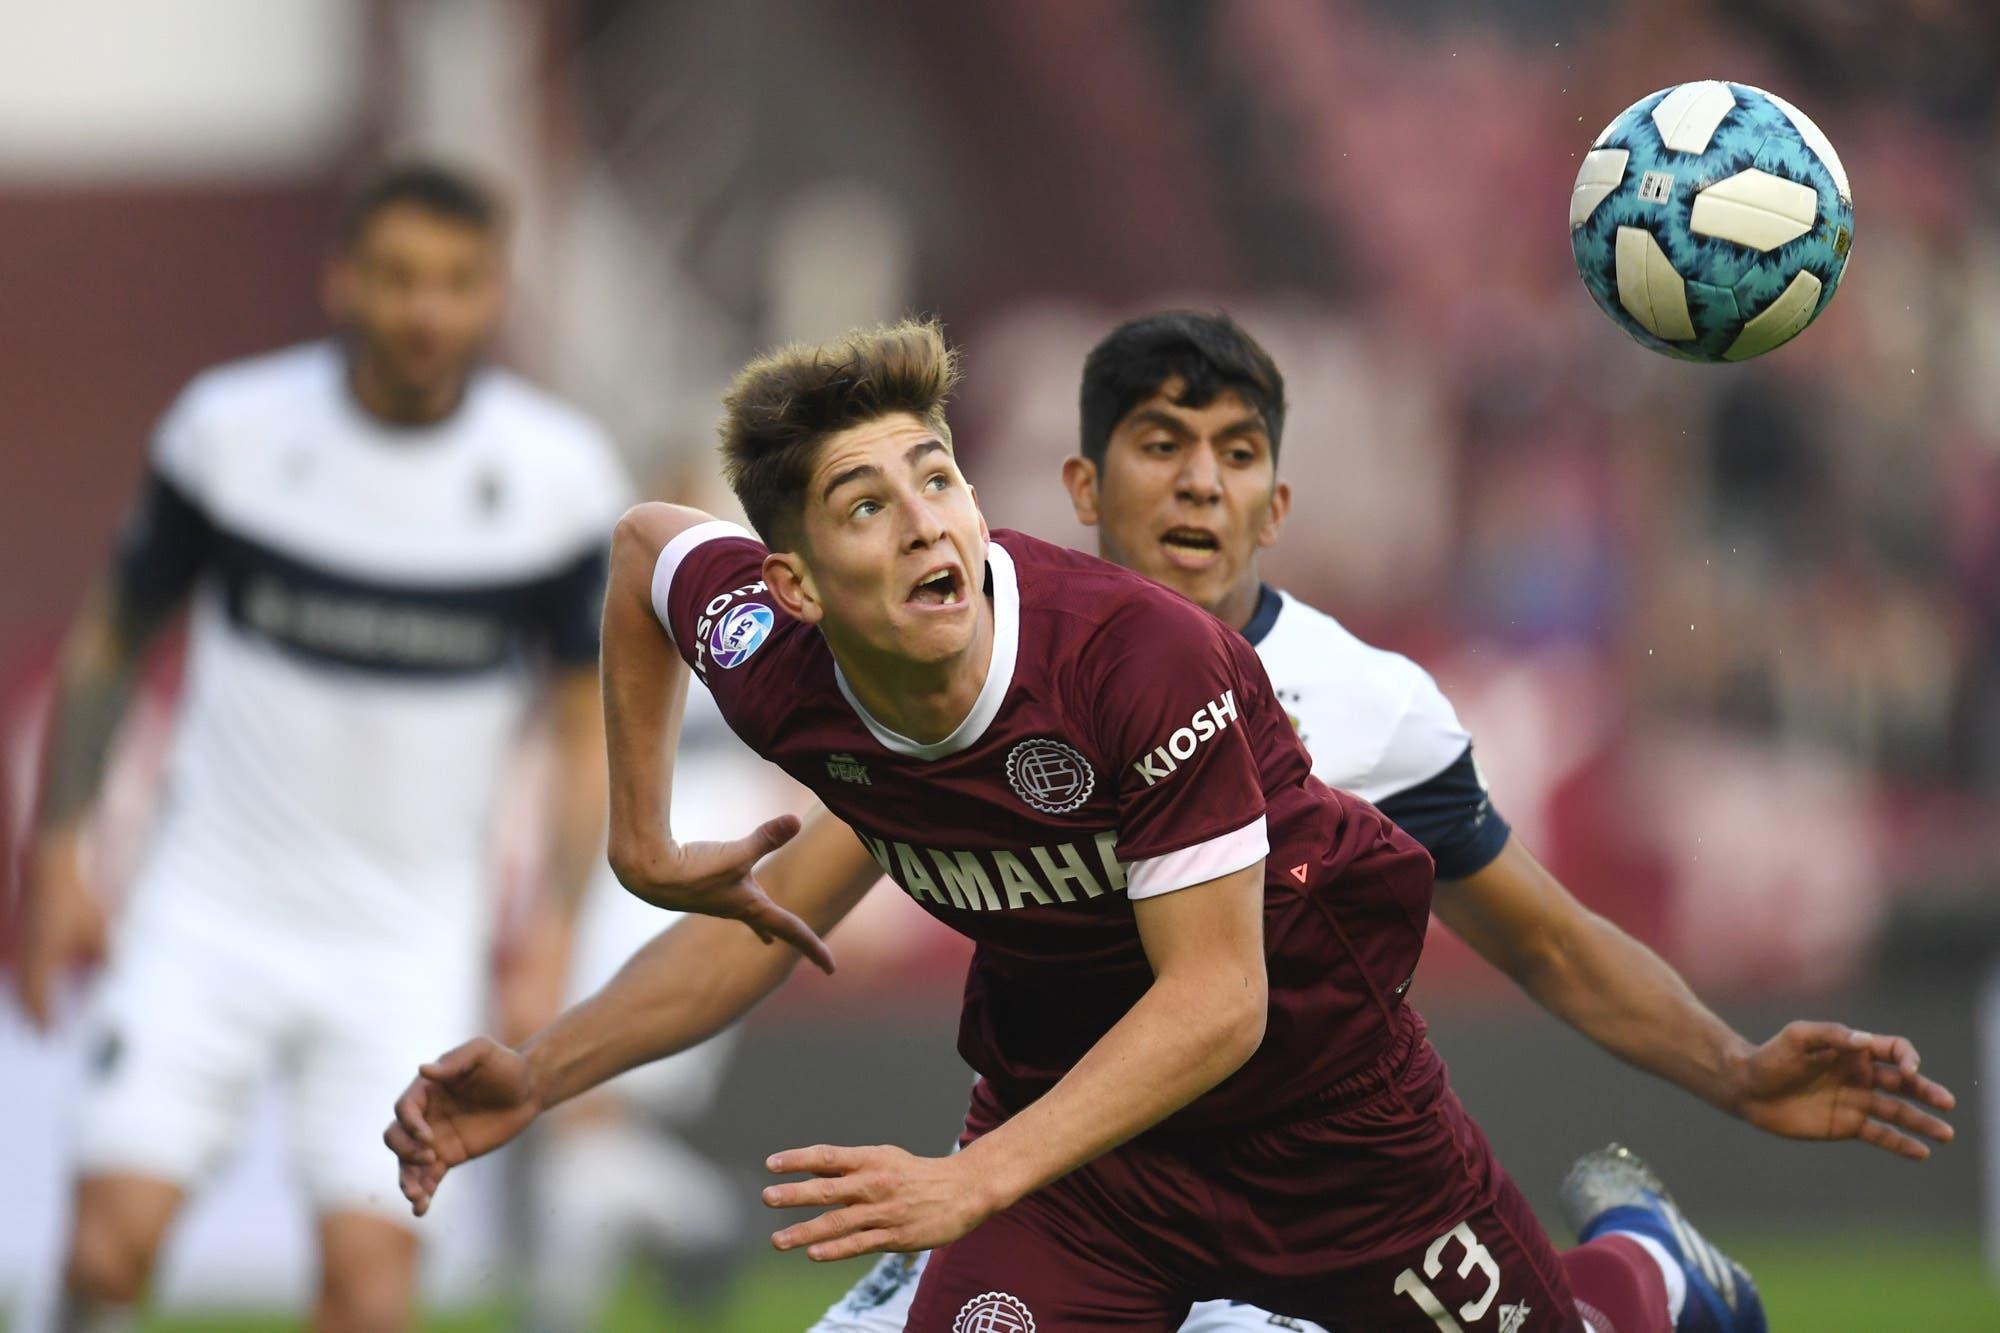 Lanús y Gimnasia empataron por la Superliga